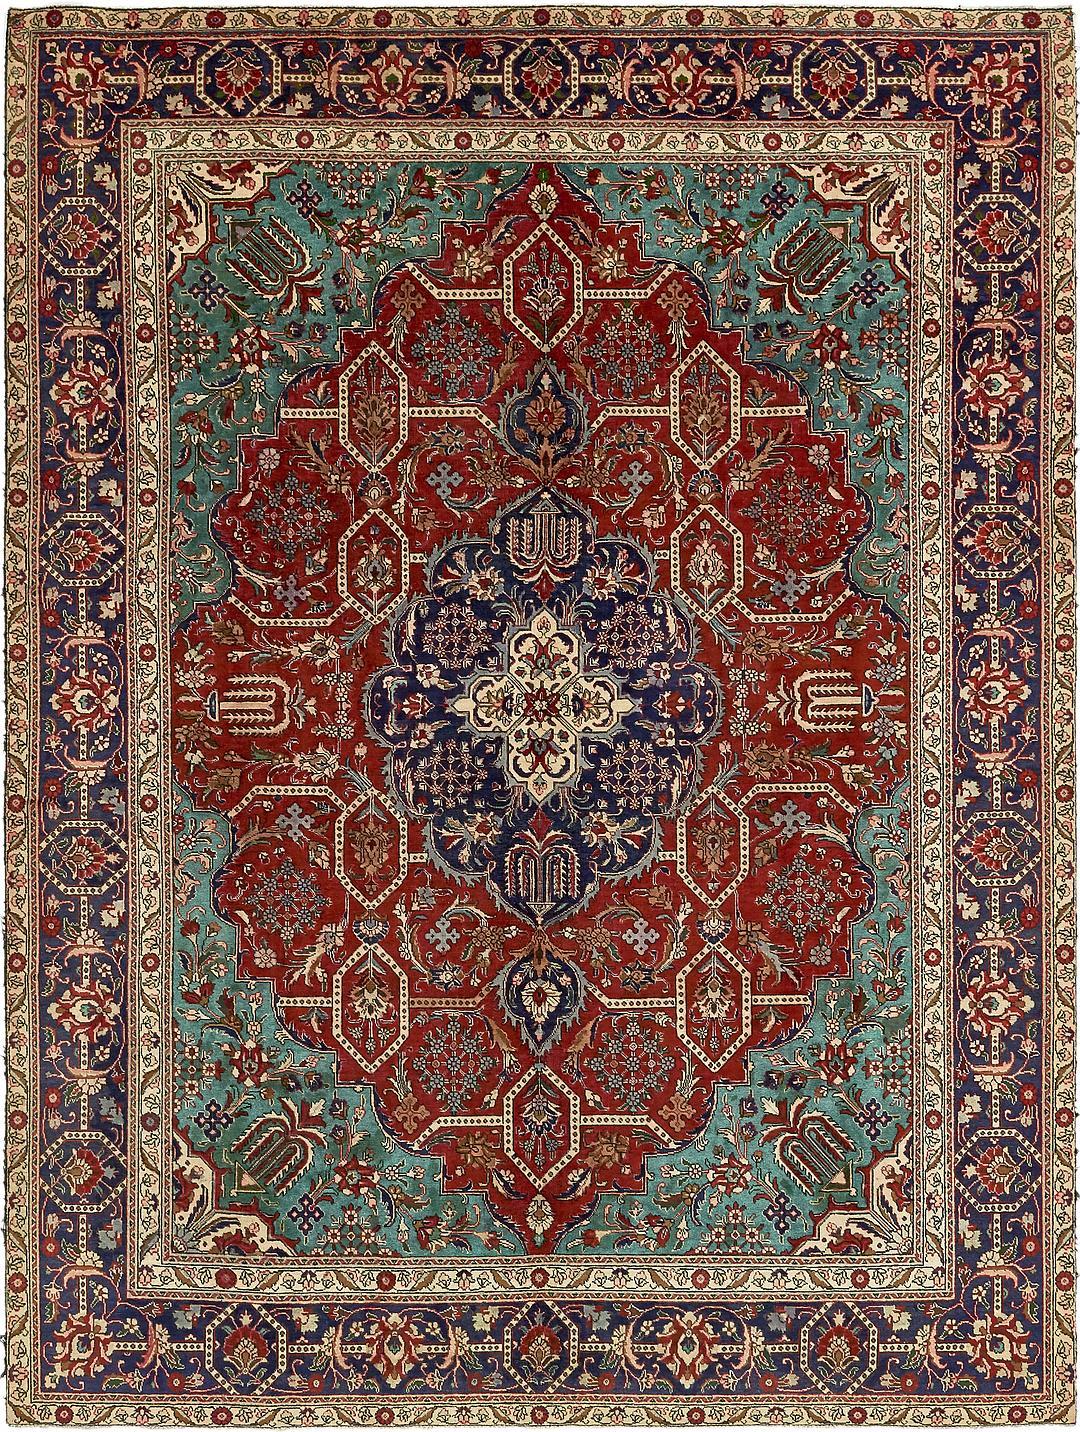 Red 9 6 X 12 10 Tabriz Persian Rug Persian Rugs